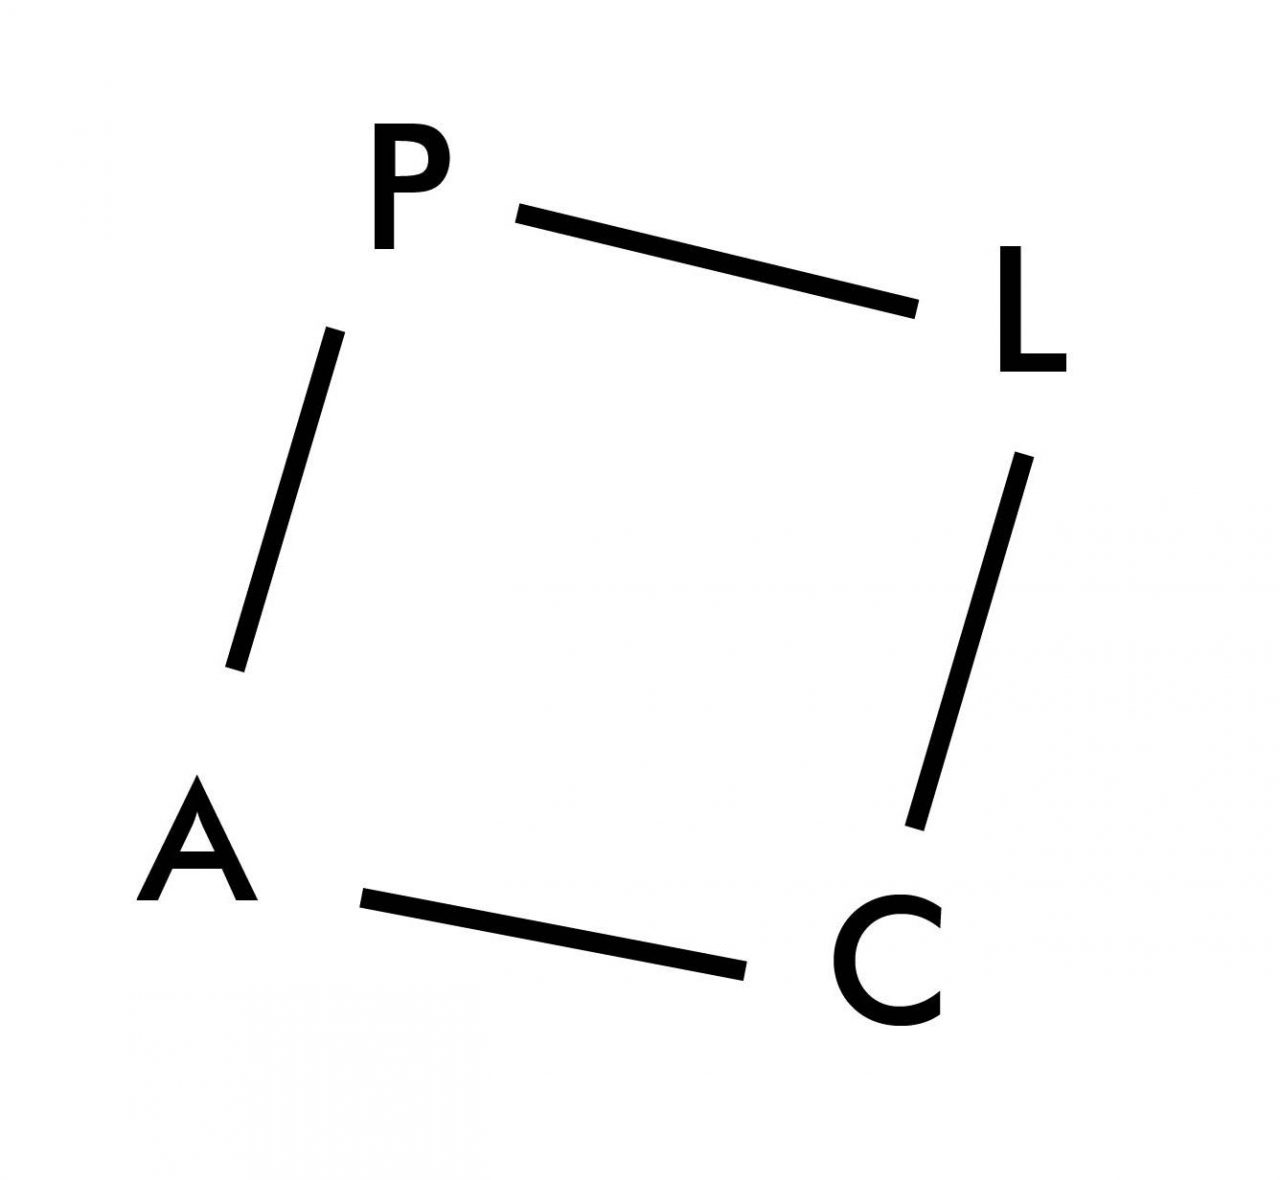 Radio-Plac-Logo-1280x1180.jpg